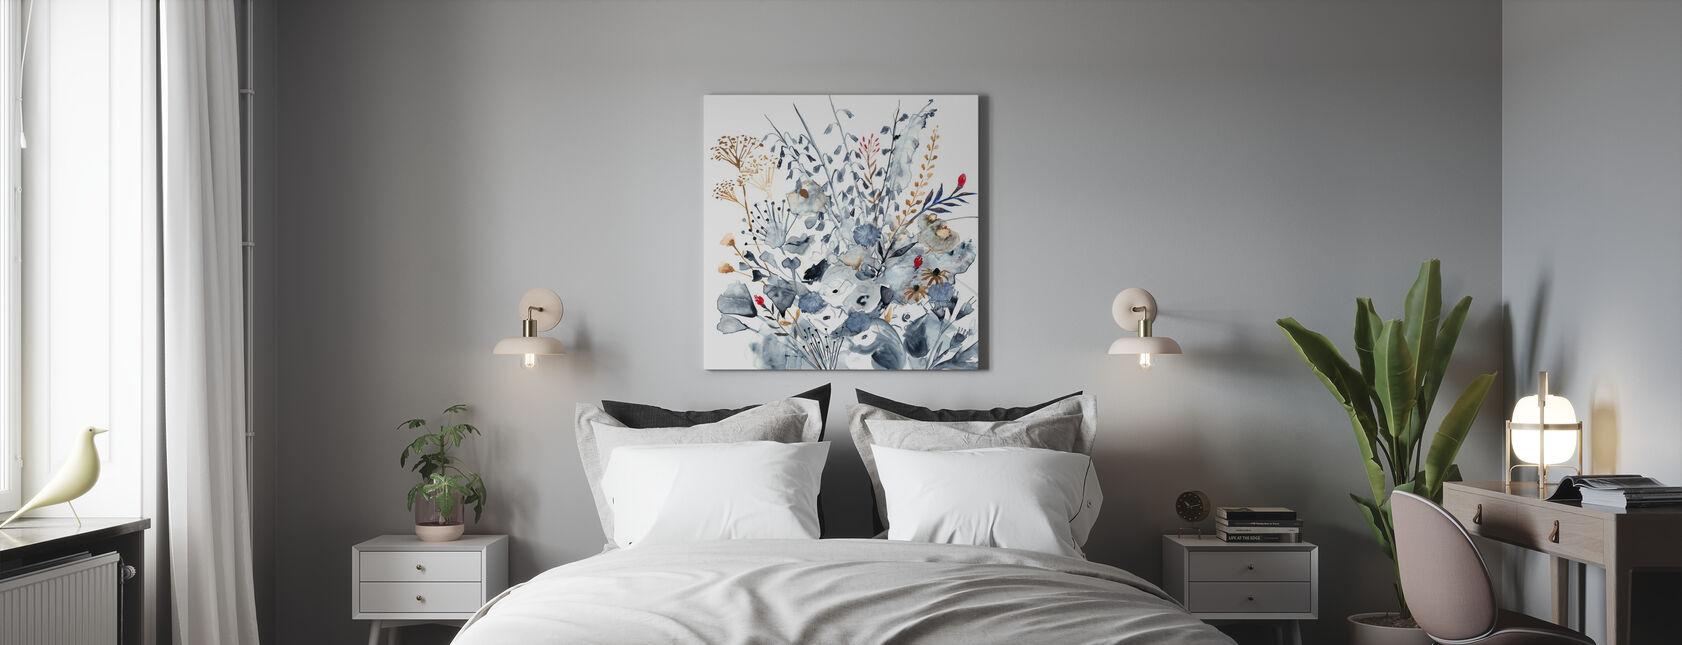 Indigo Ochre - Canvas print - Bedroom